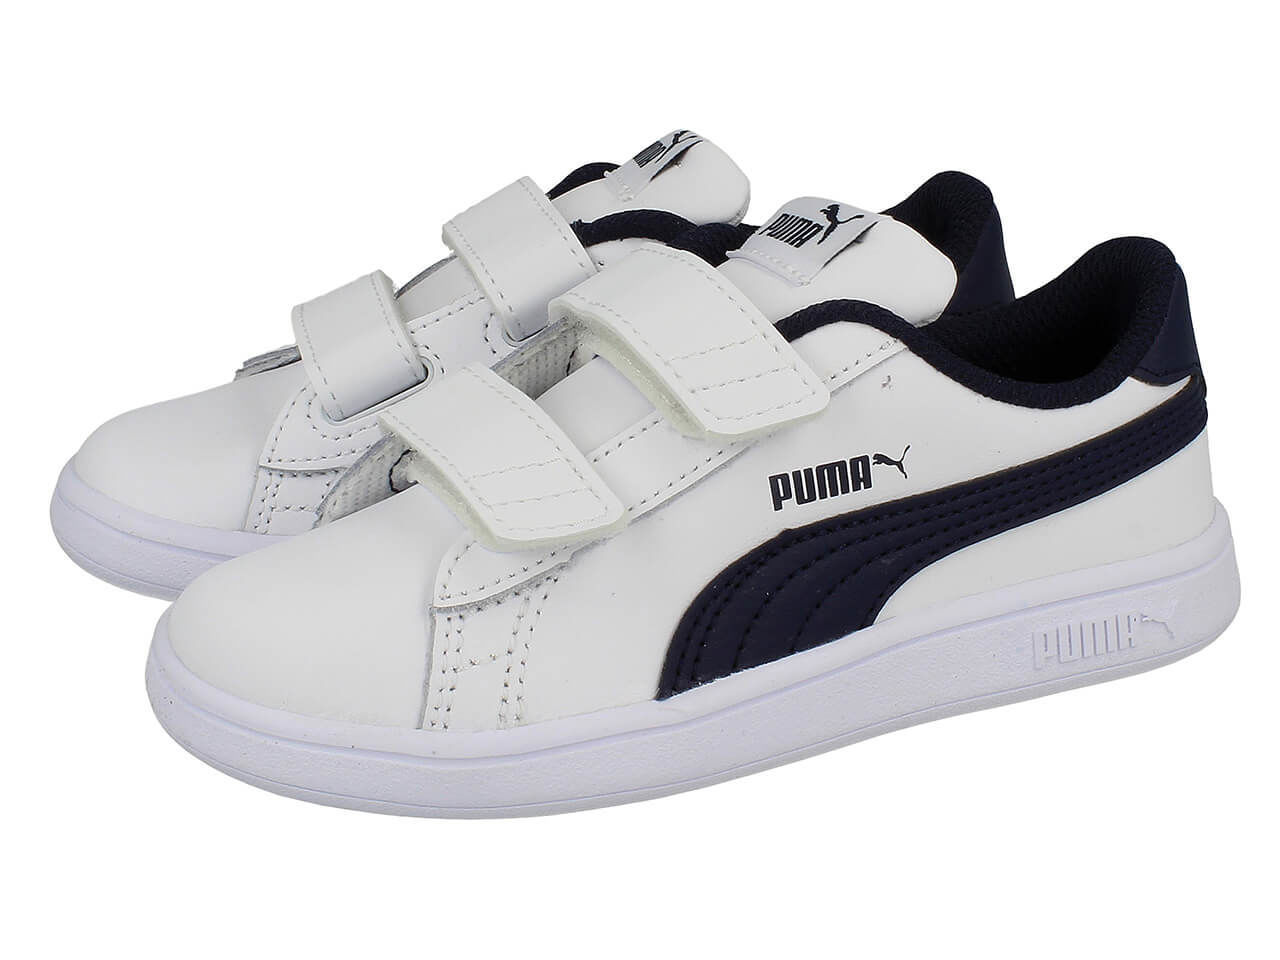 Buty Puma Smash v2 L V 36517304 # 34,5 7361664748